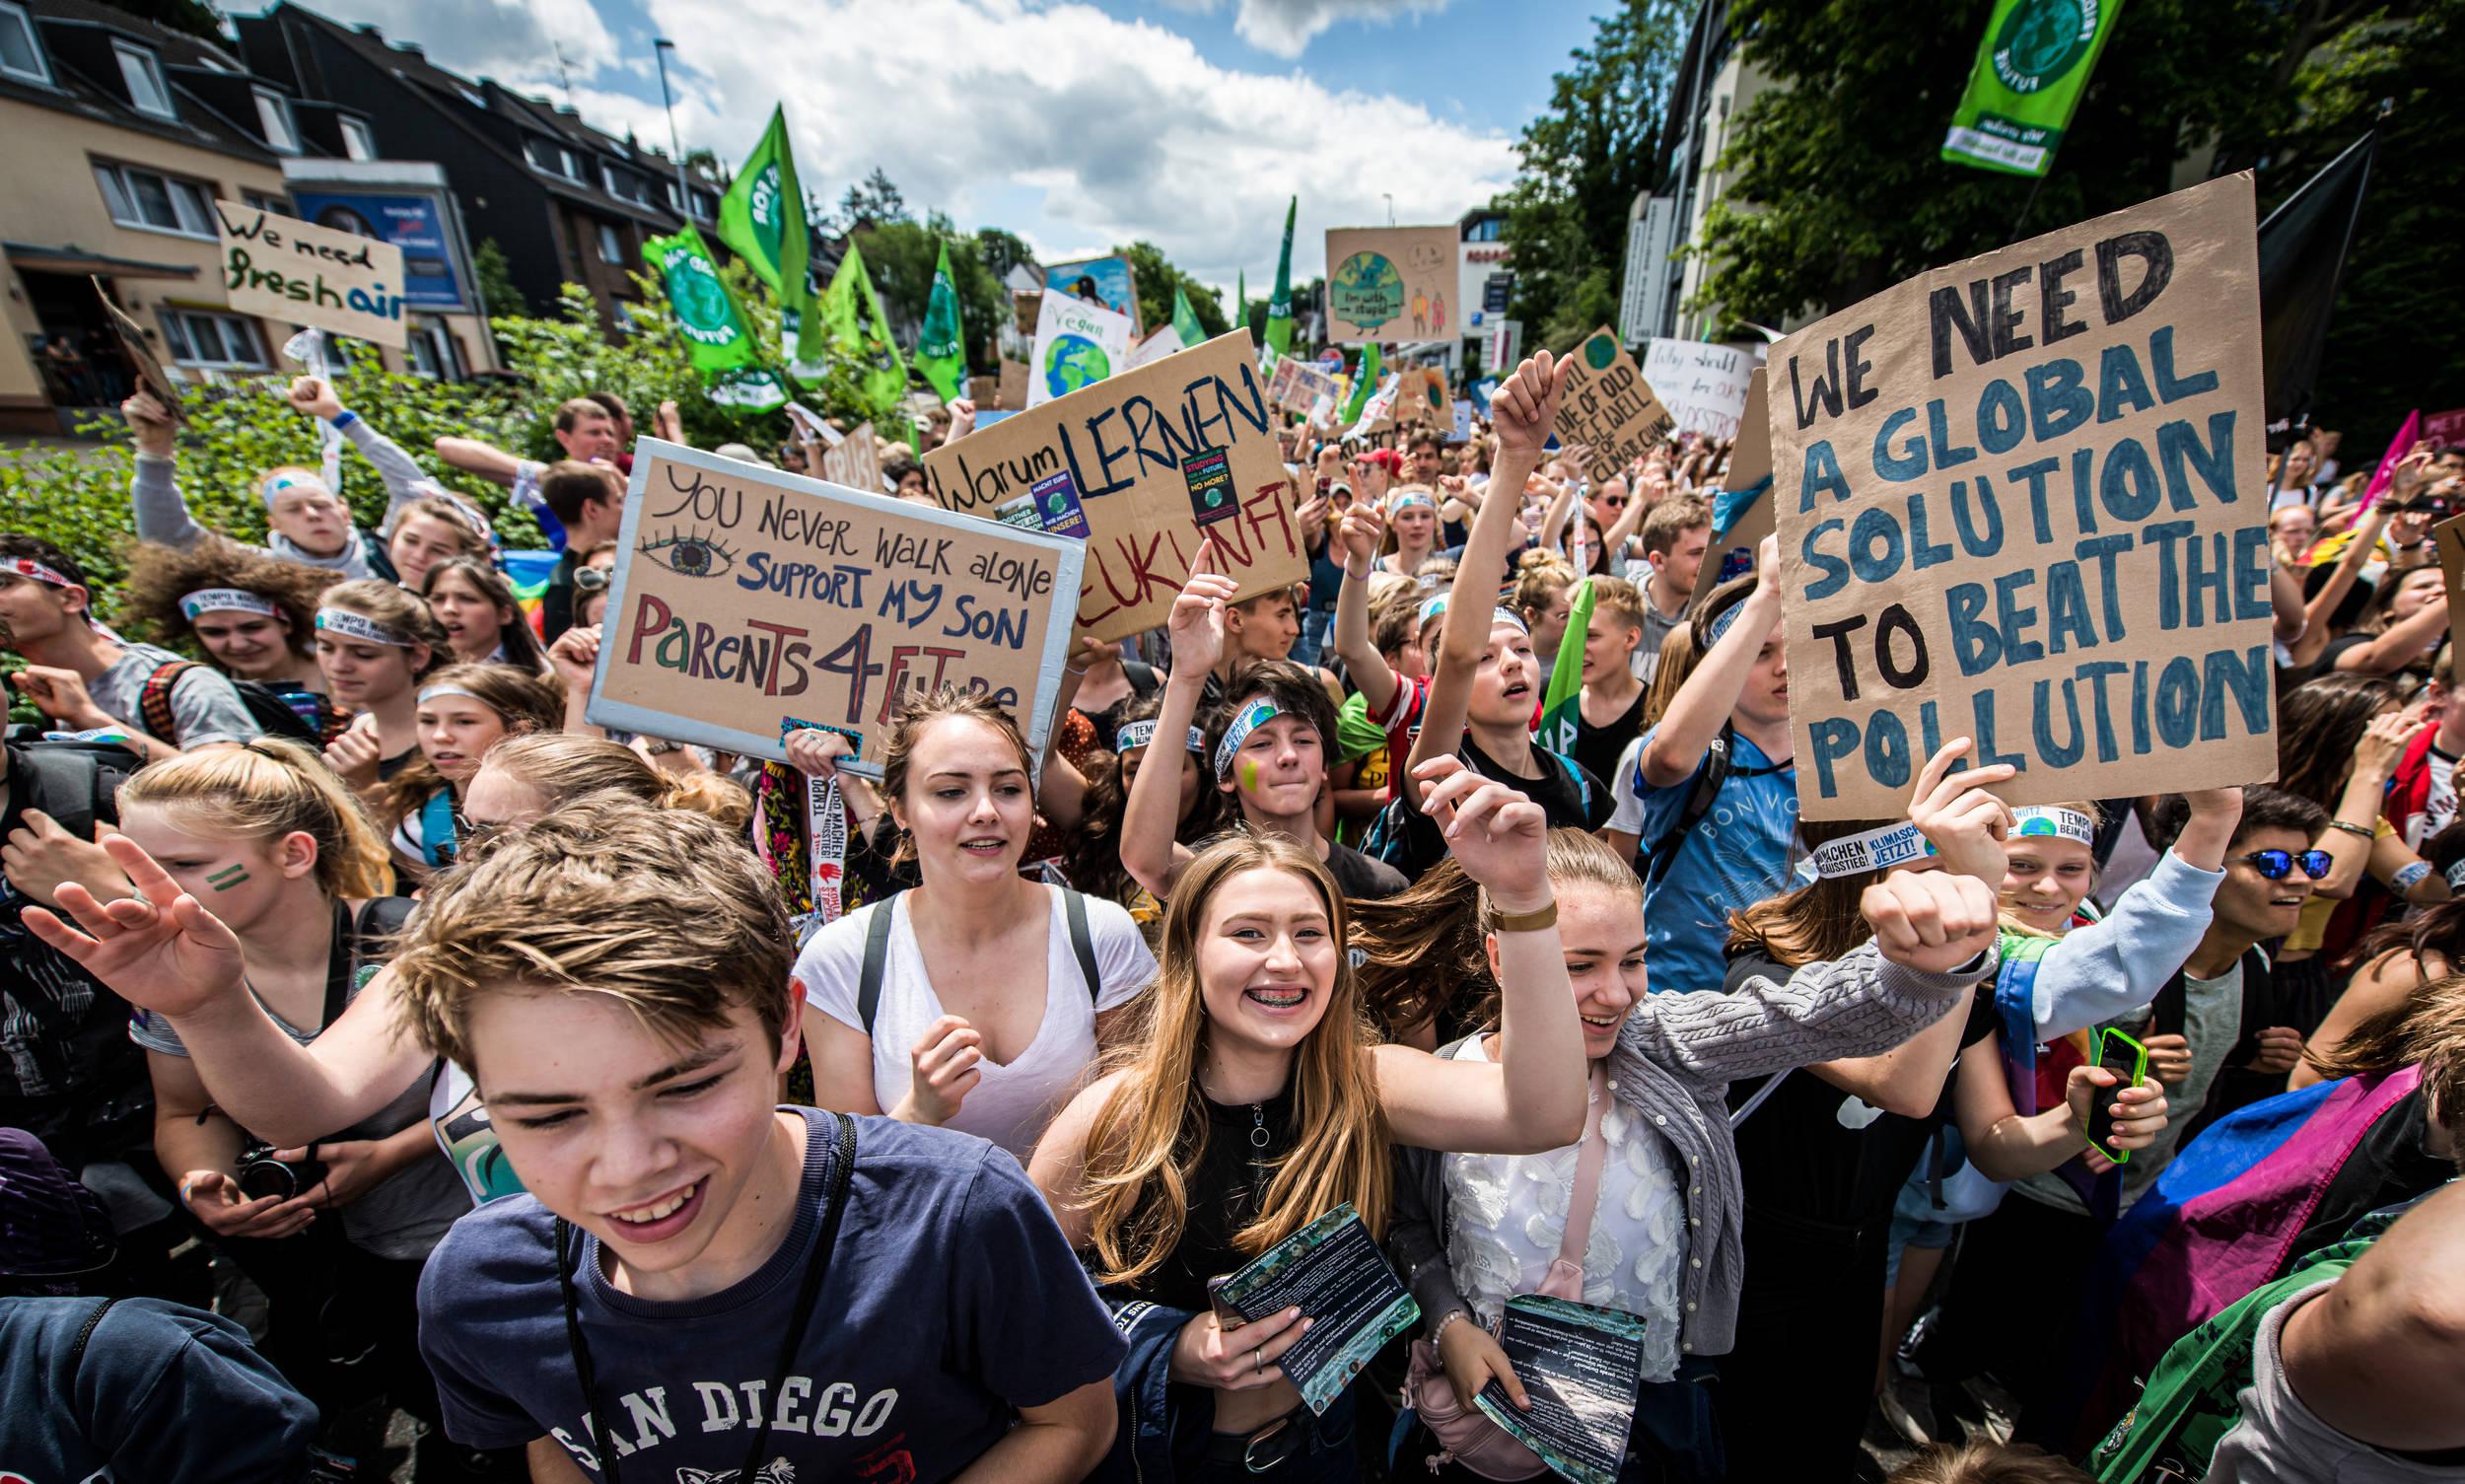 Klimawandel Folgen Fuer Menschen Klimagerechtigkeit Demo 264713 Fridays For Future C Petr Zewlakk Vrabec Greenpeace